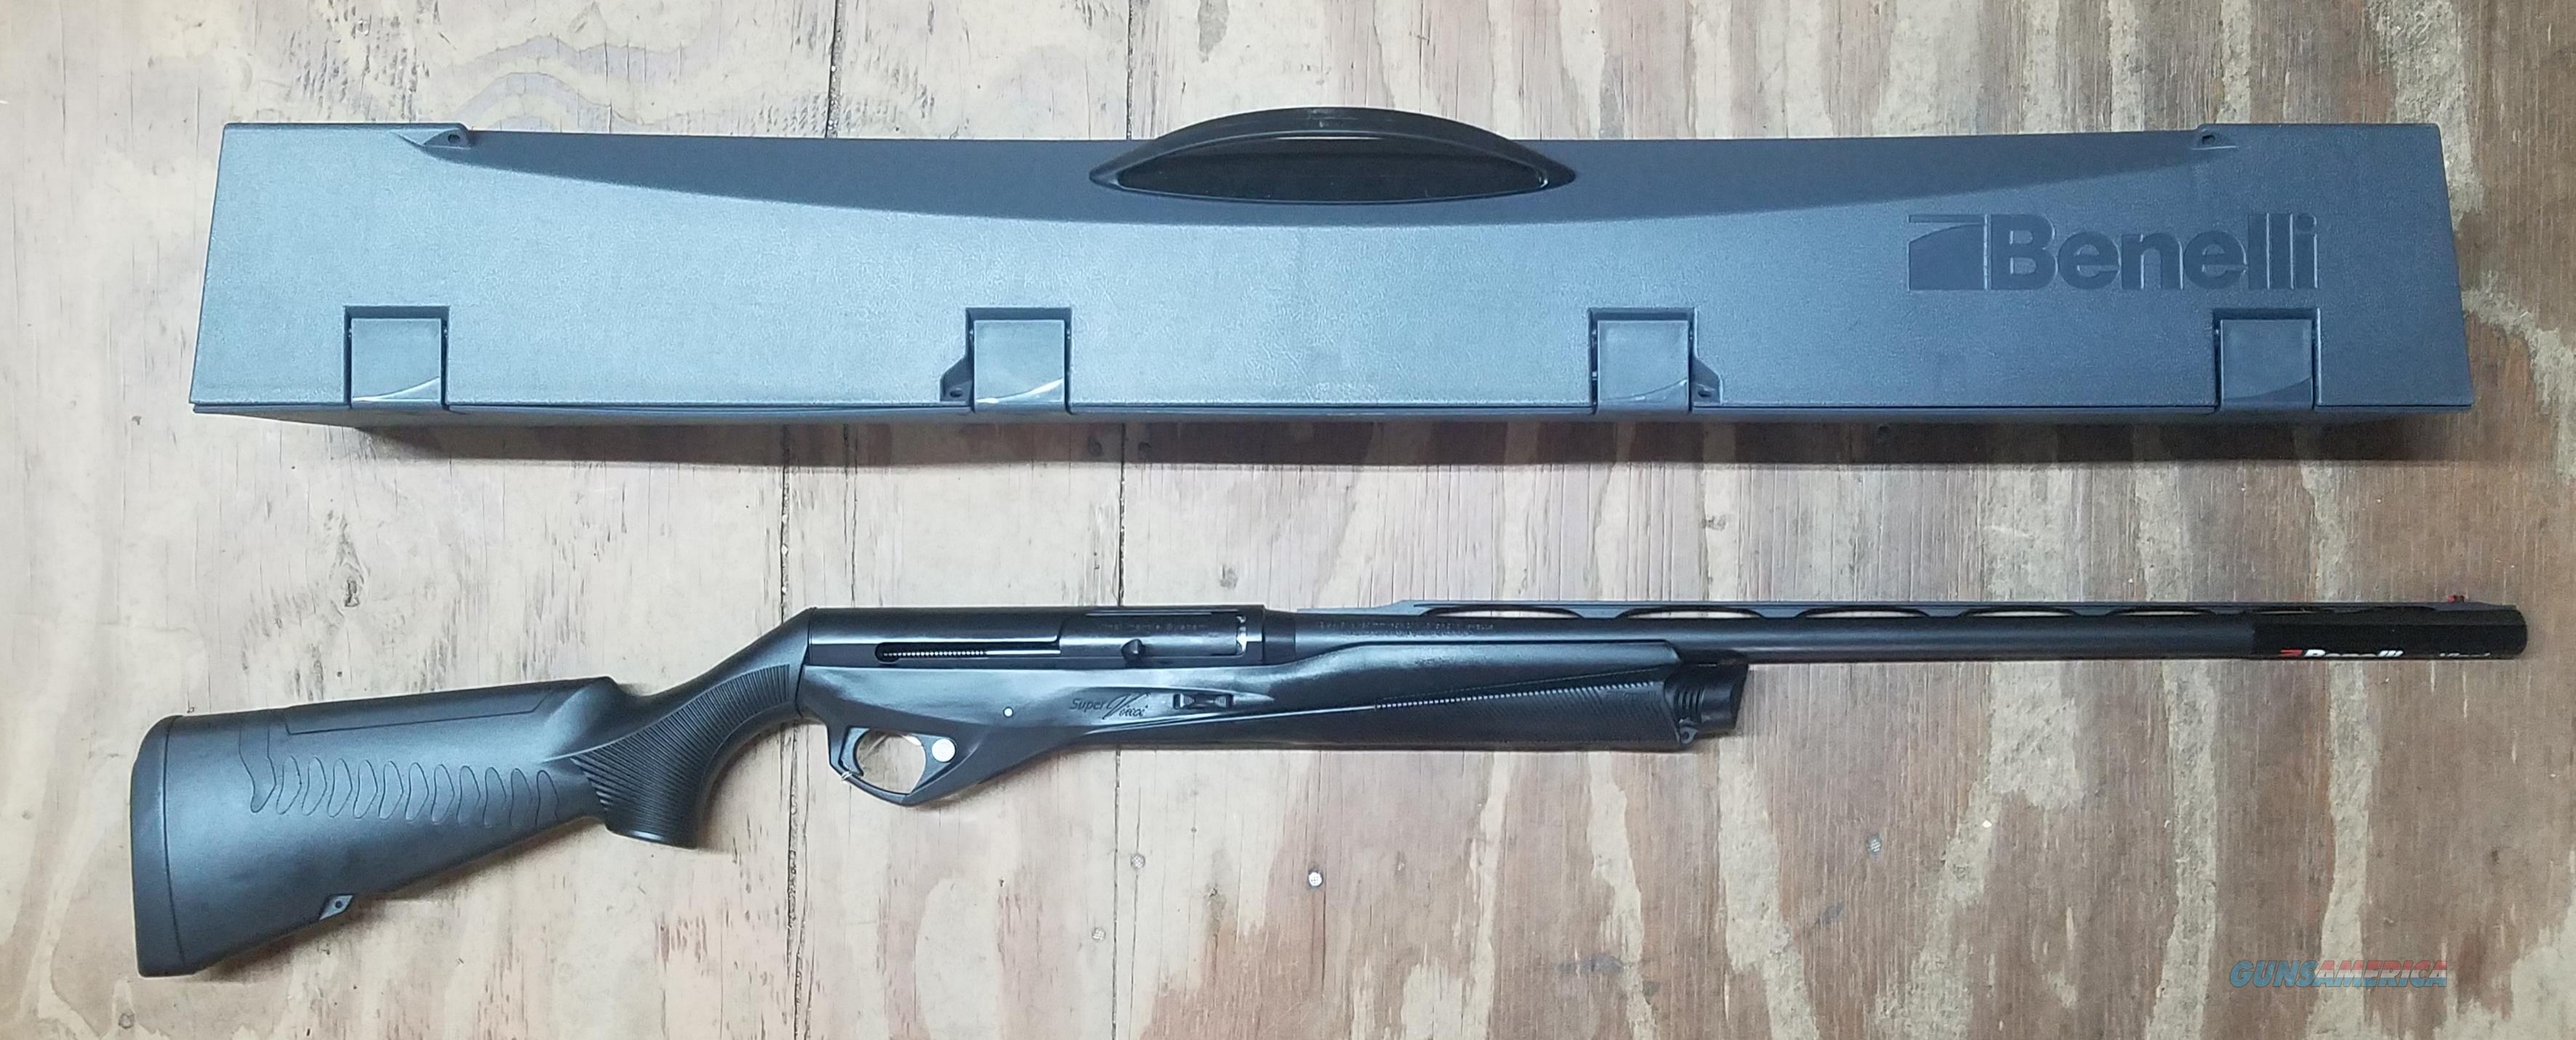 Benelli Super Vinci 12 Gauge 10550  Guns > Shotguns > Benelli Shotguns > Sporting